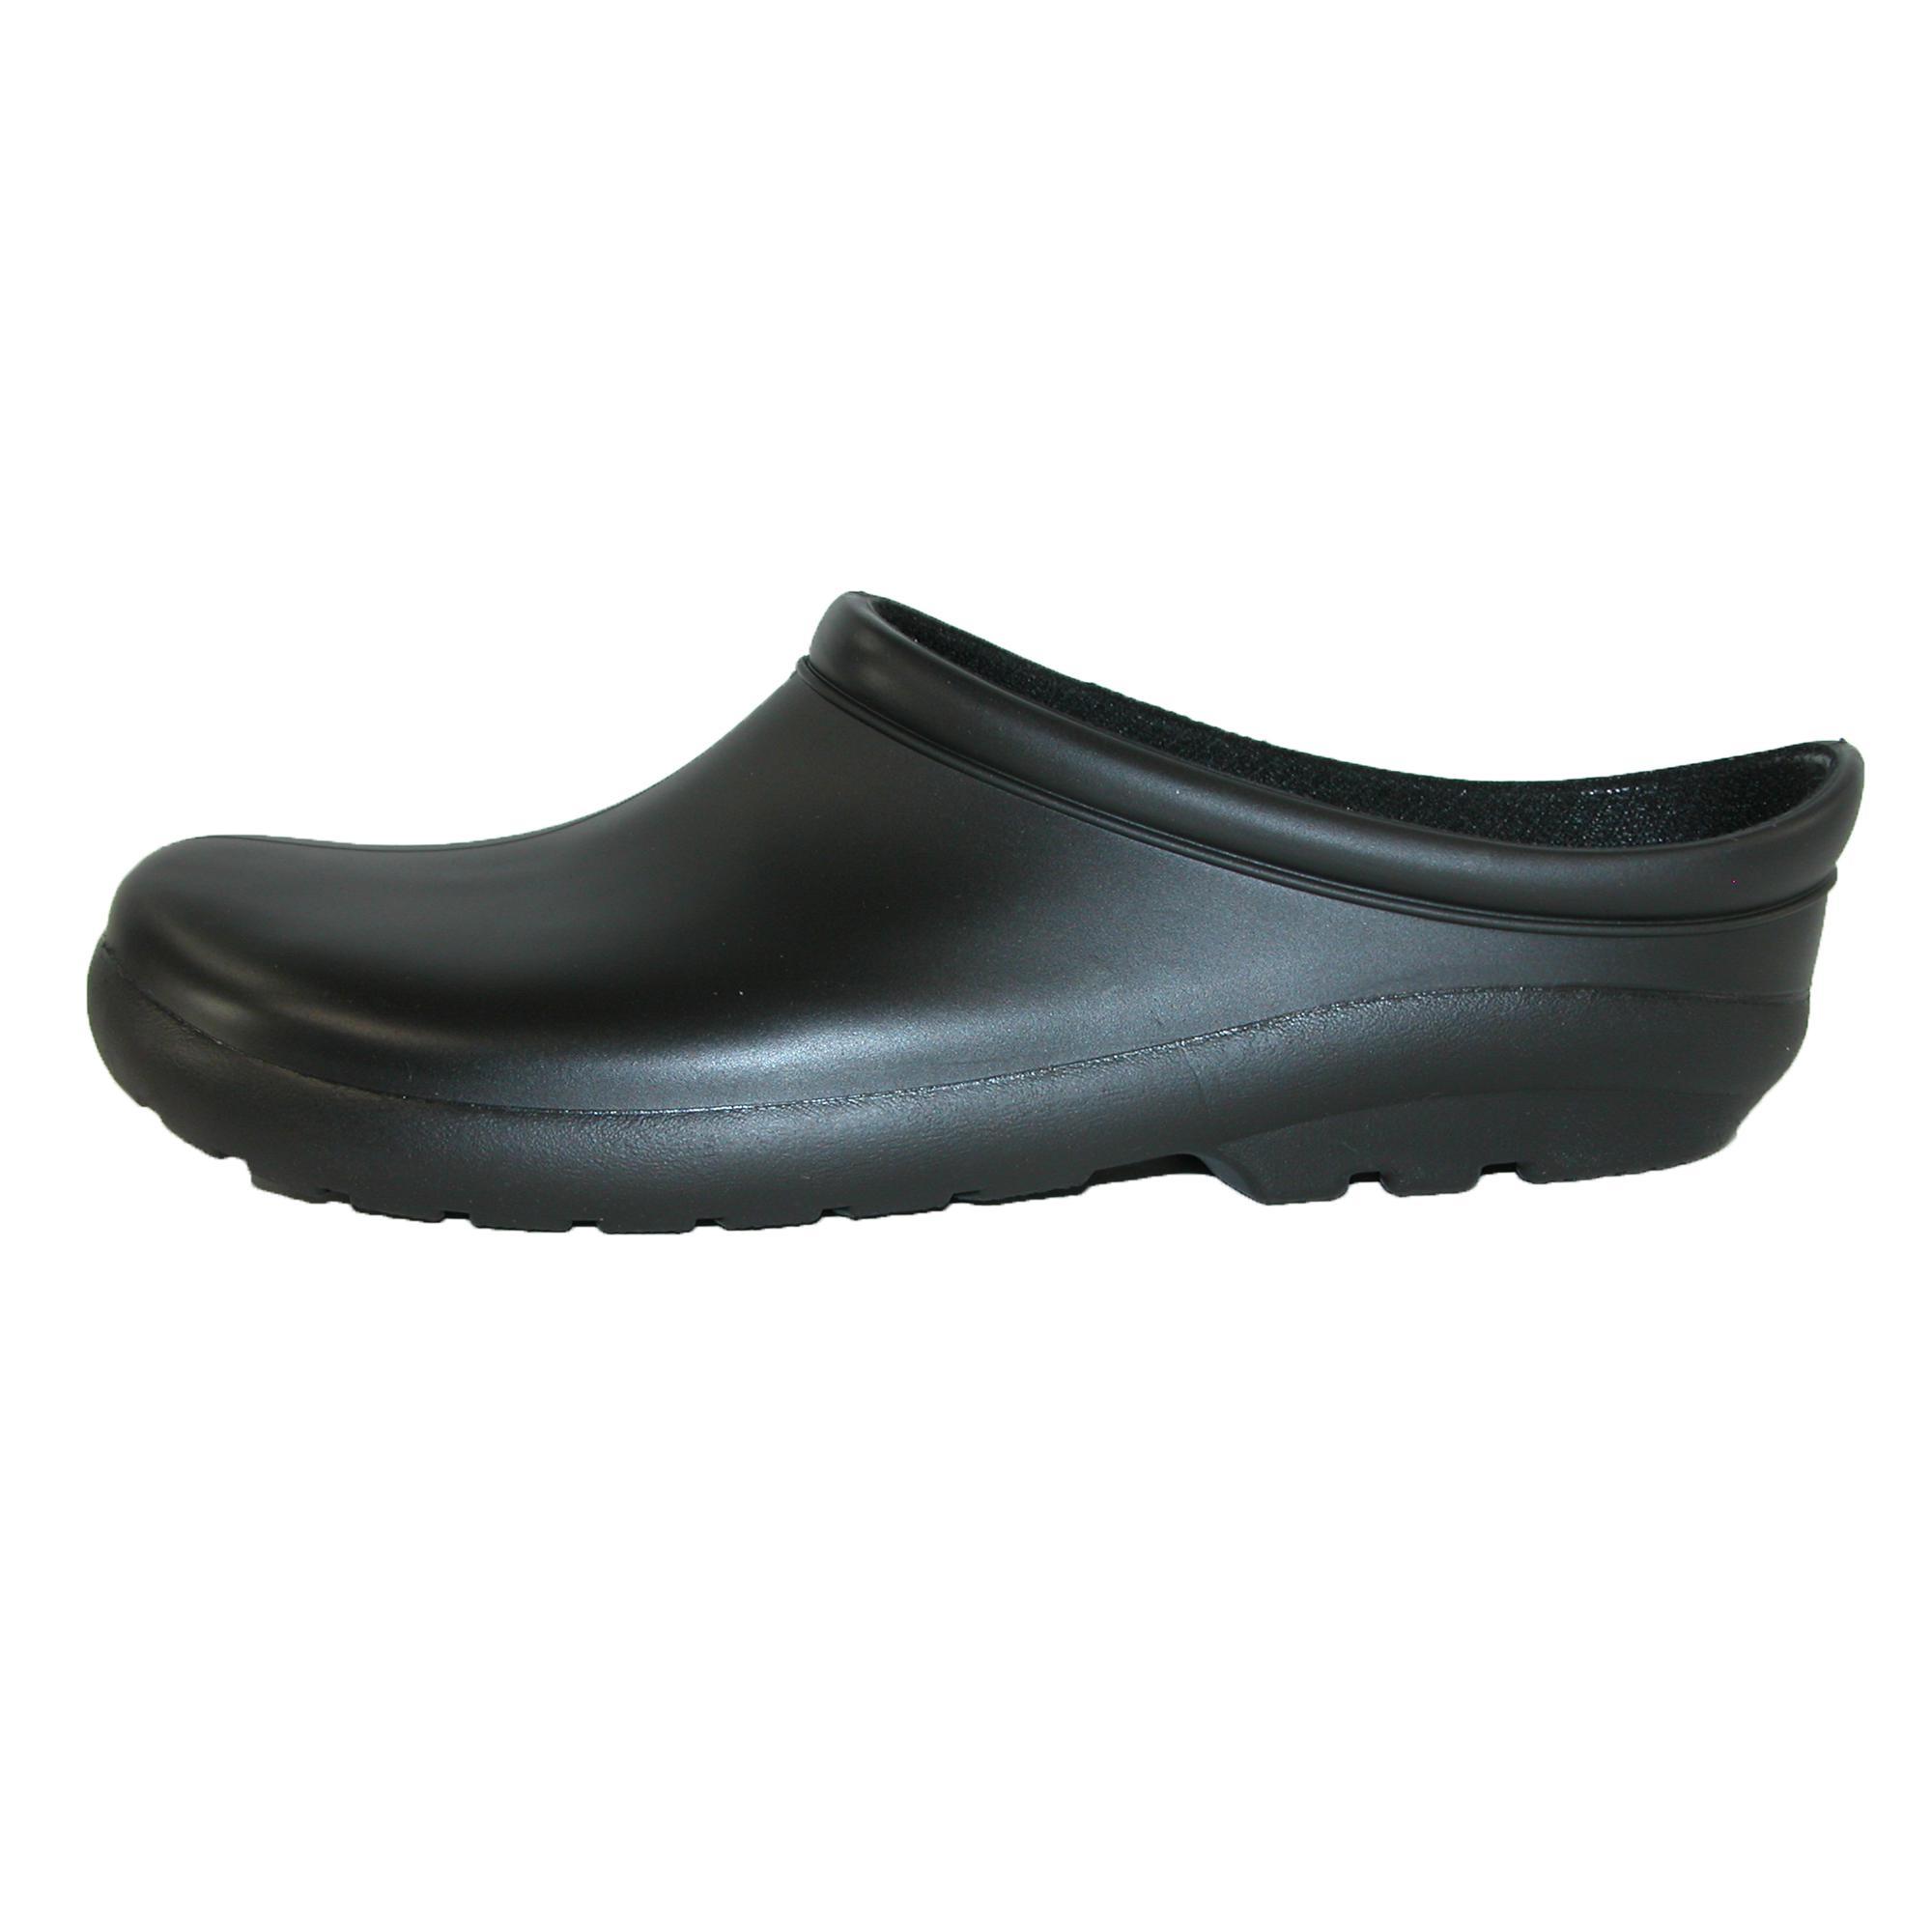 New Sloggers Men/'s Short Clog Slip On Rain Shoes